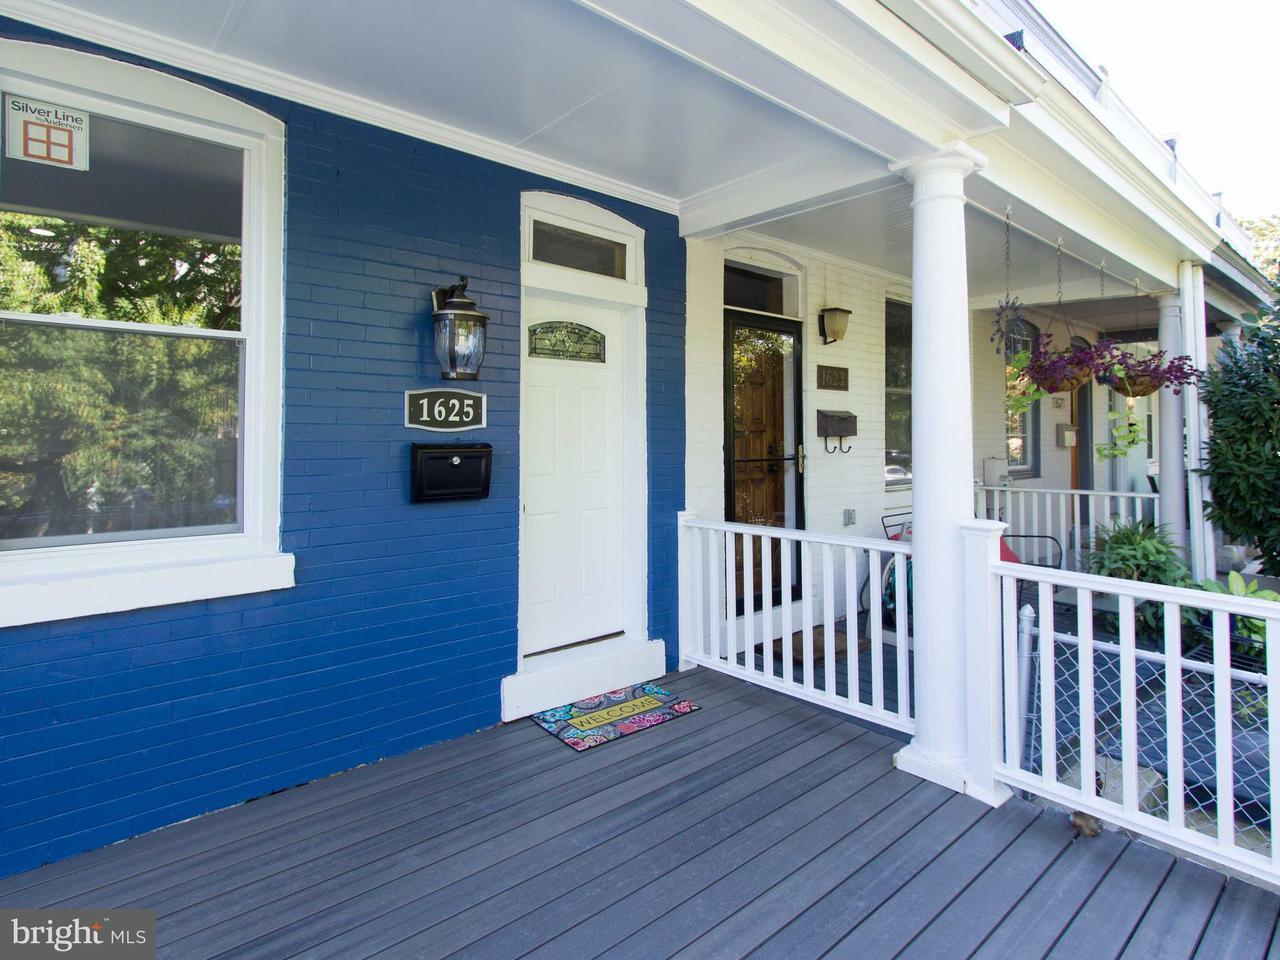 Additional photo for property listing at 1625 C St Se 1625 C St Se Washington, Округ Колумбия 20003 Соединенные Штаты